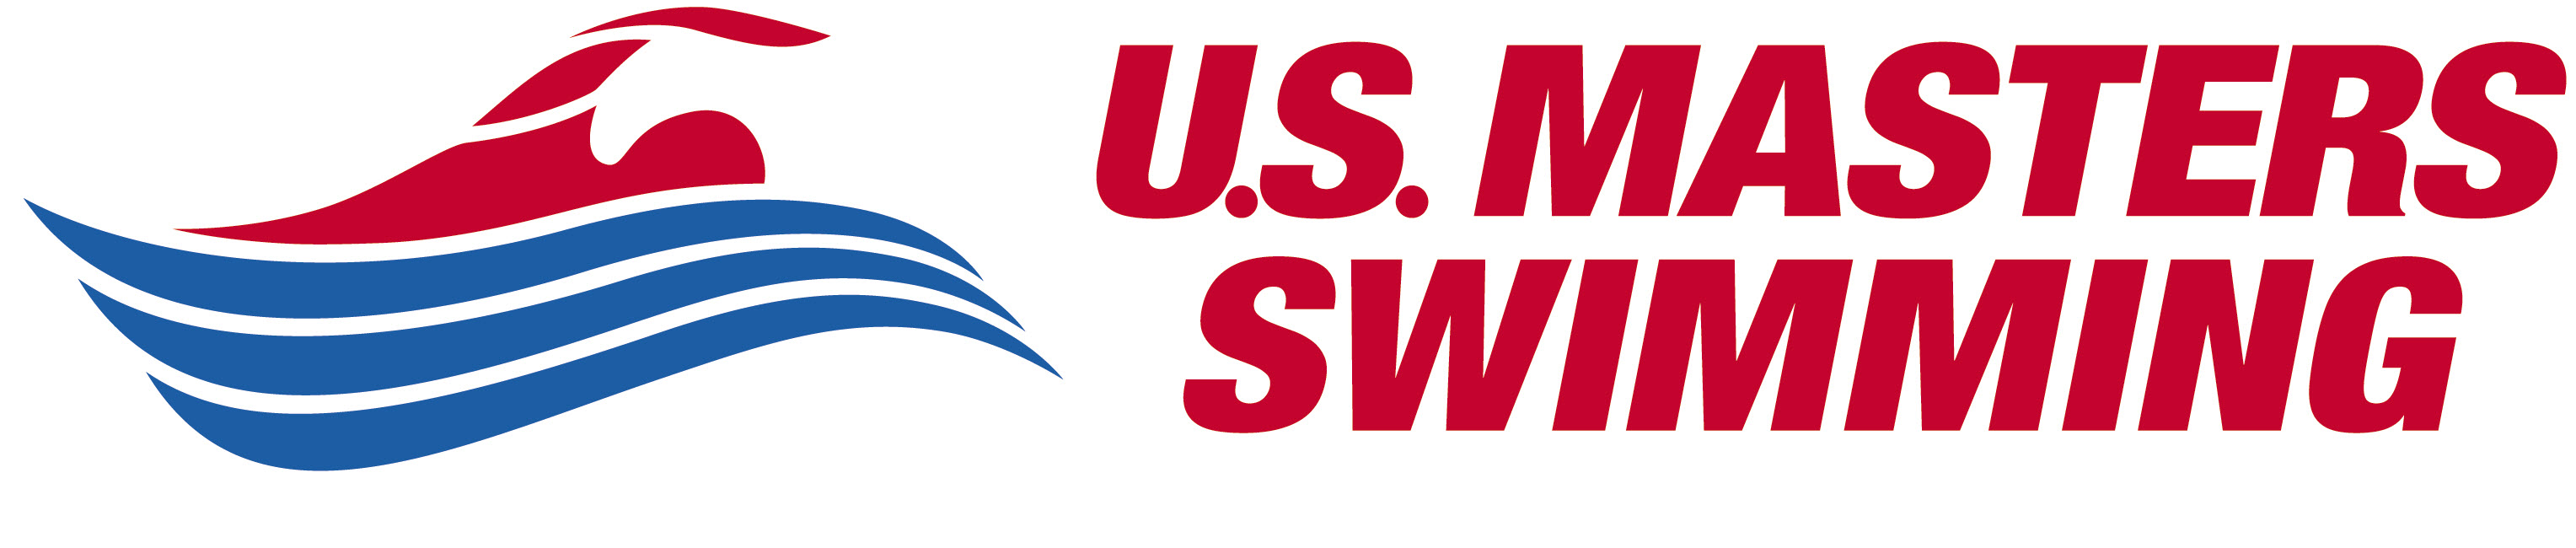 United States Masters Swimming